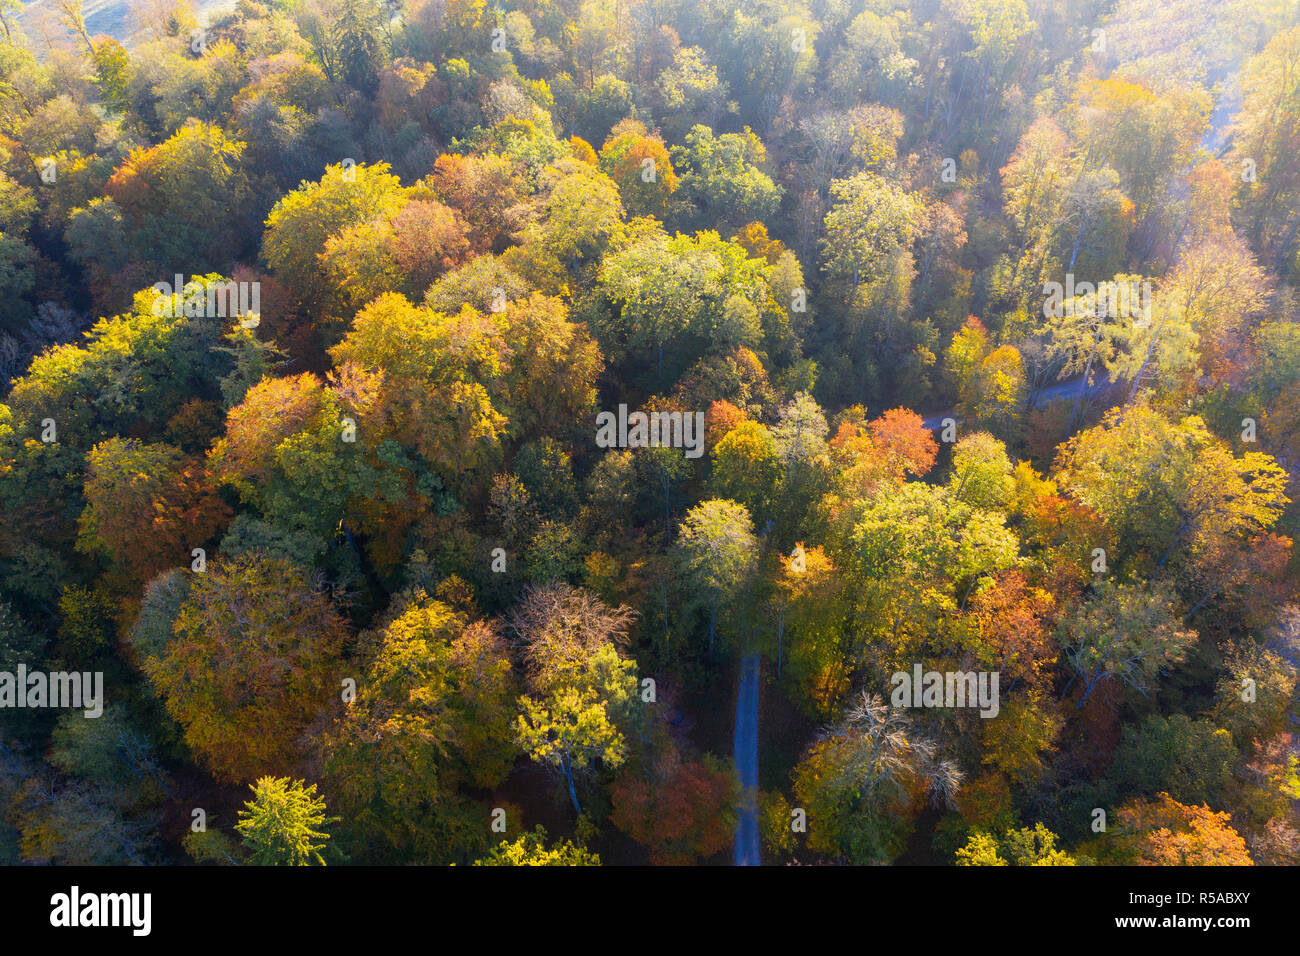 Autumnal deciduous forest, drone shot, Upper Bavaria, Bavaria, Germany - Stock Image